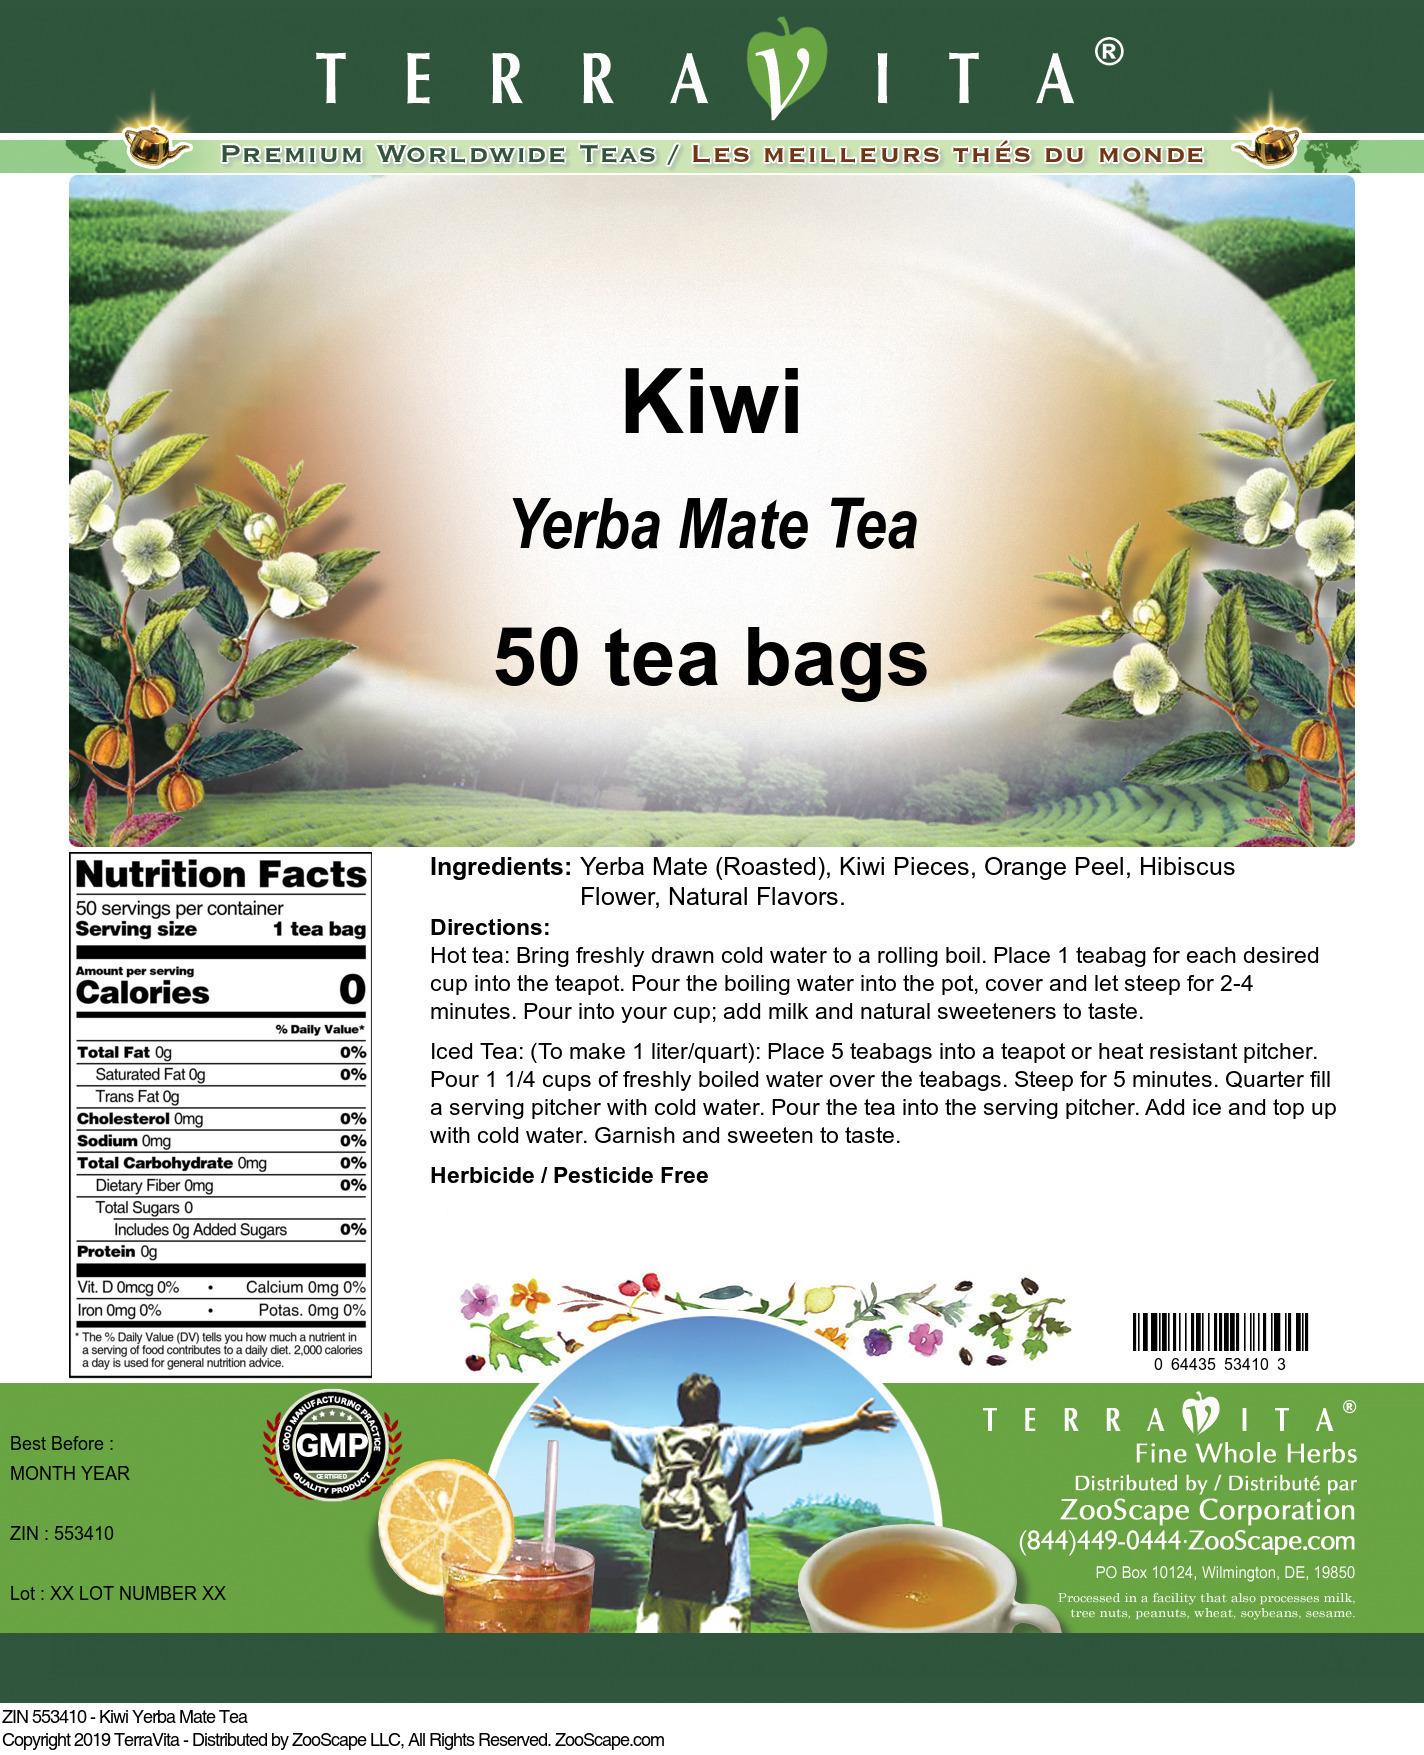 Kiwi Yerba Mate Tea